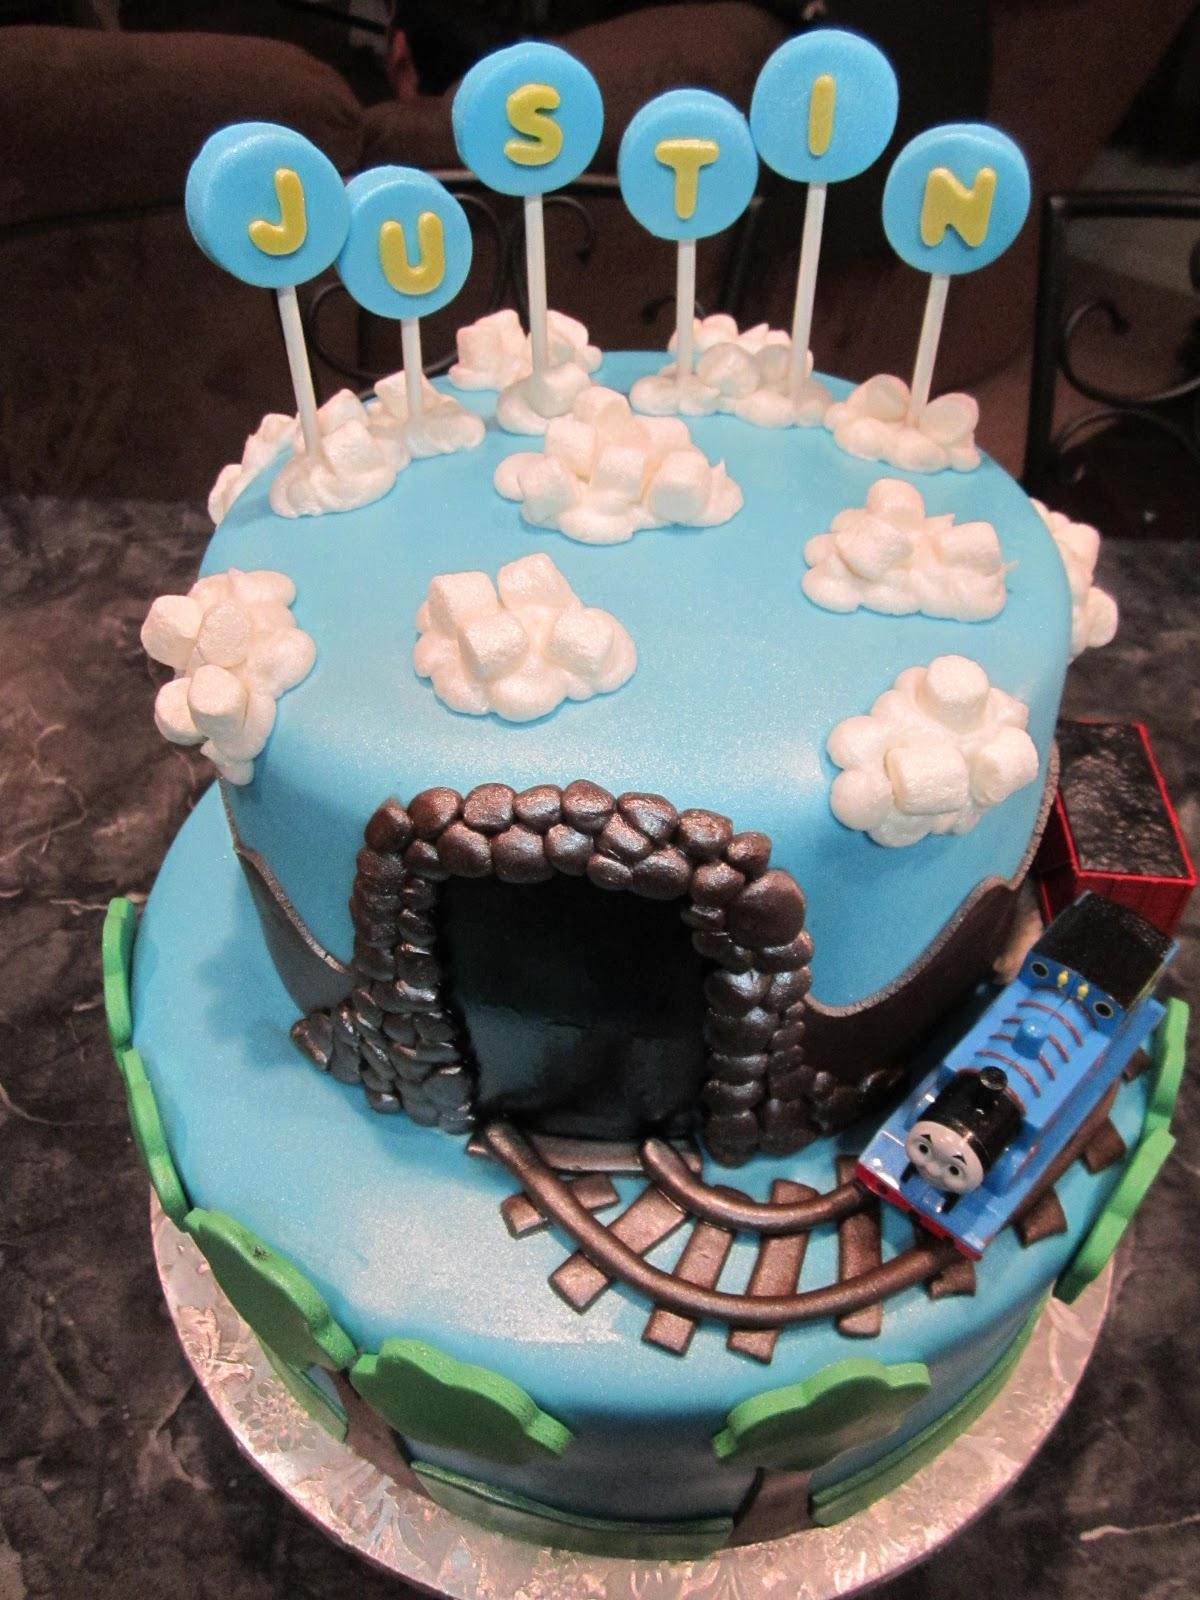 Mymonicakes Thomas The Train Cake